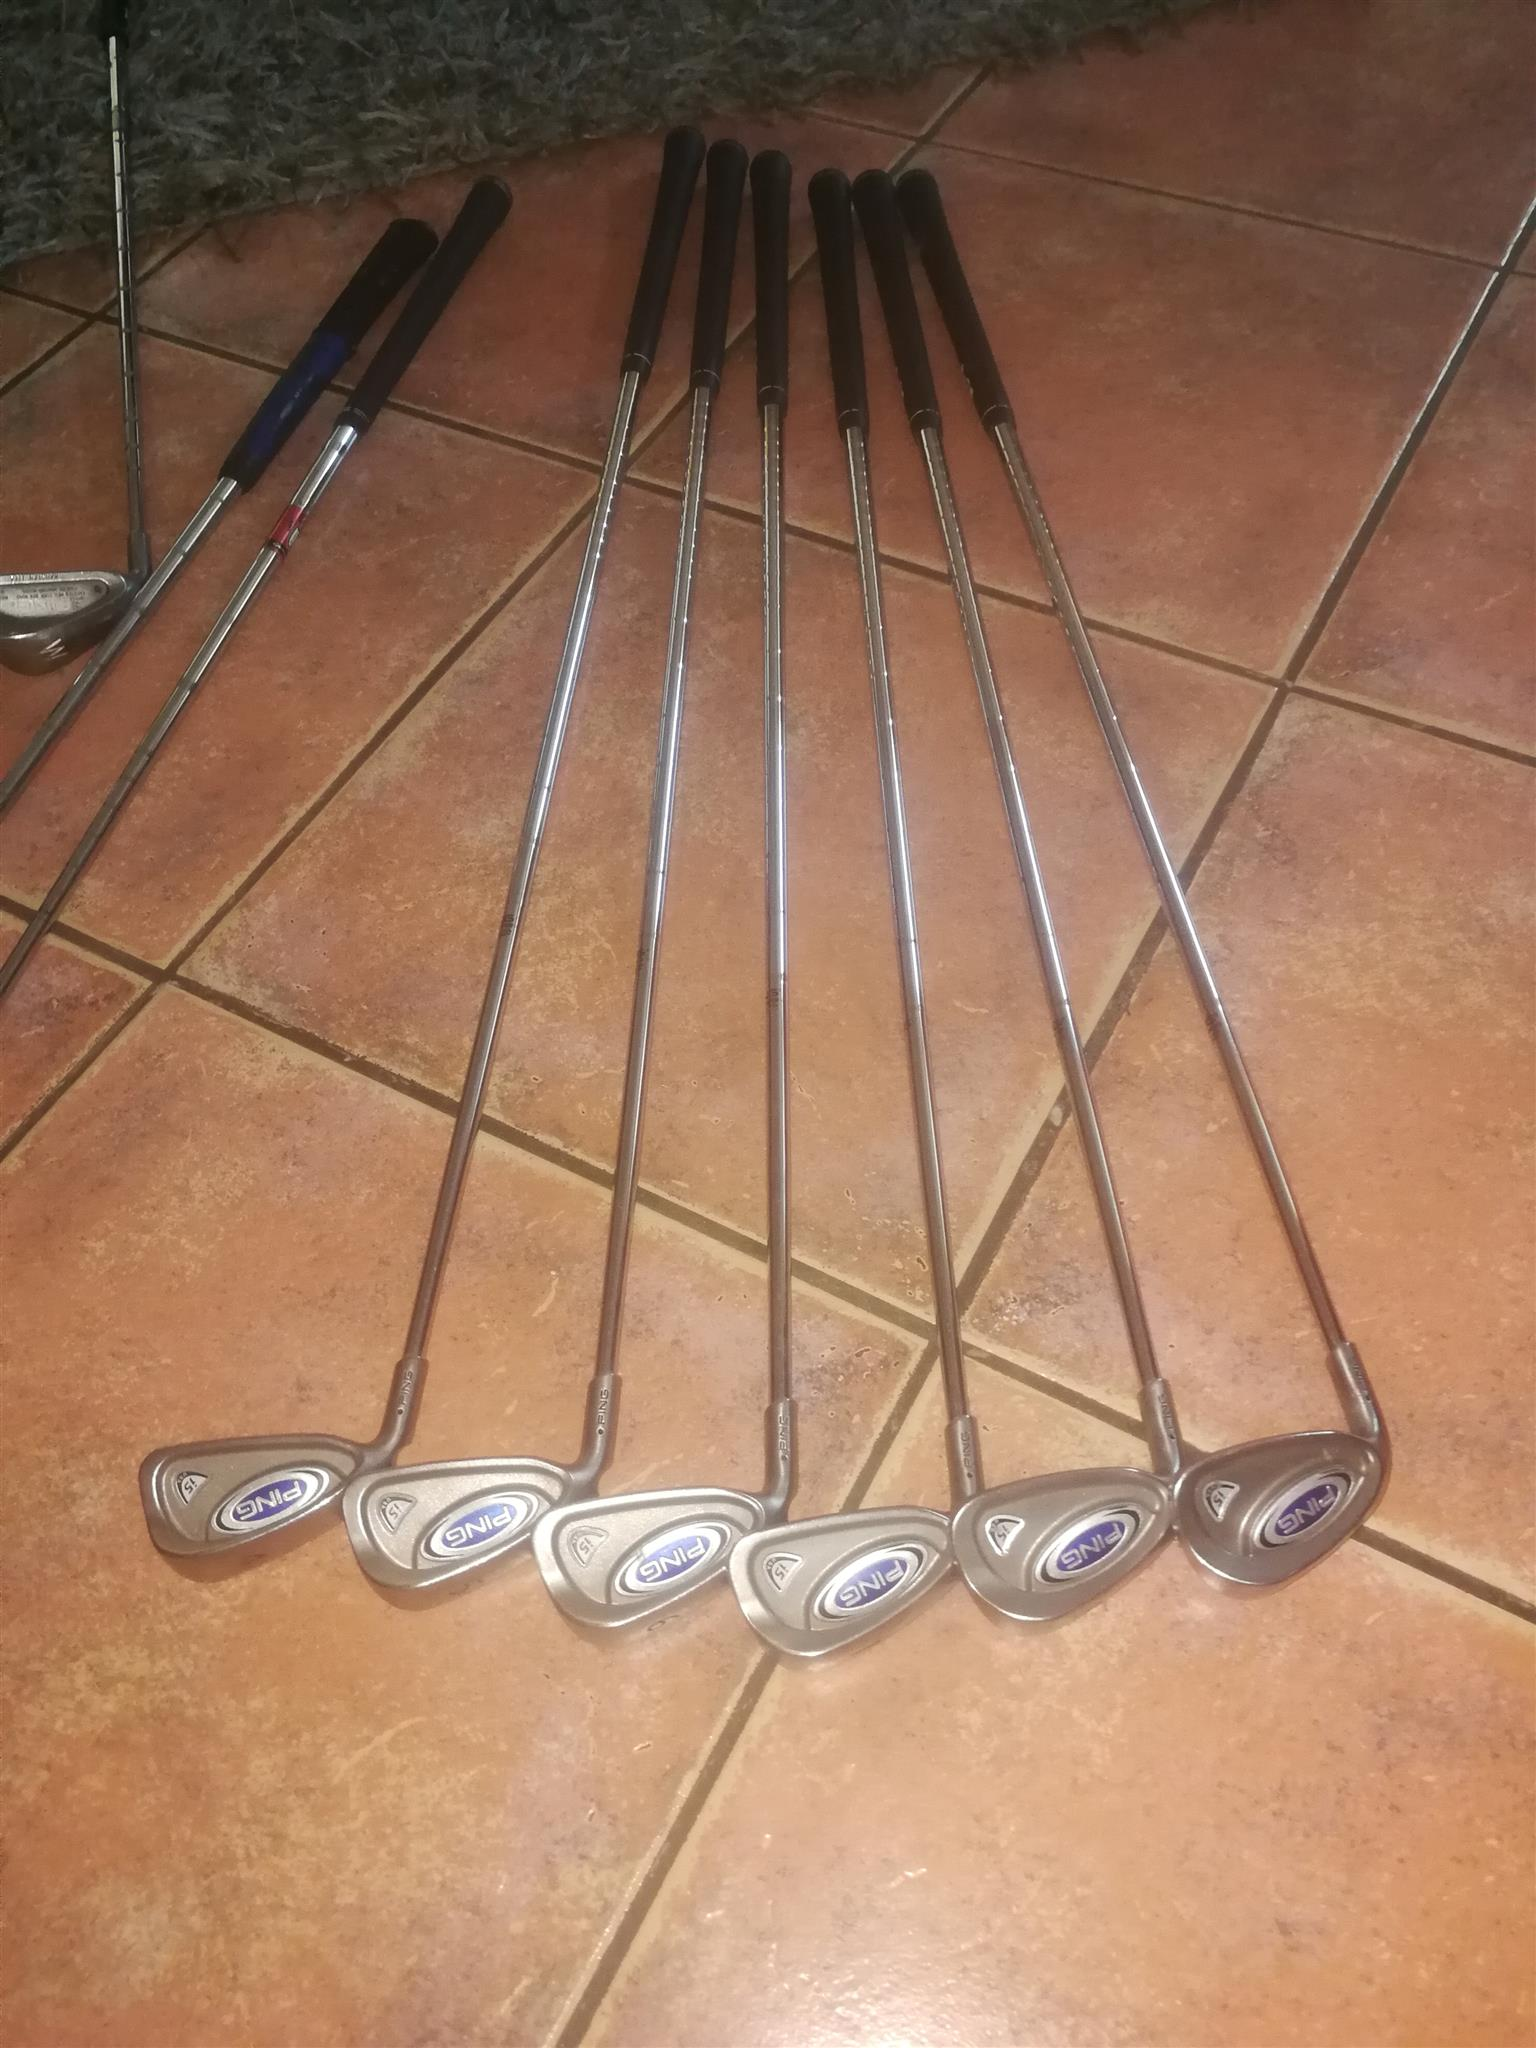 Left hand clubs